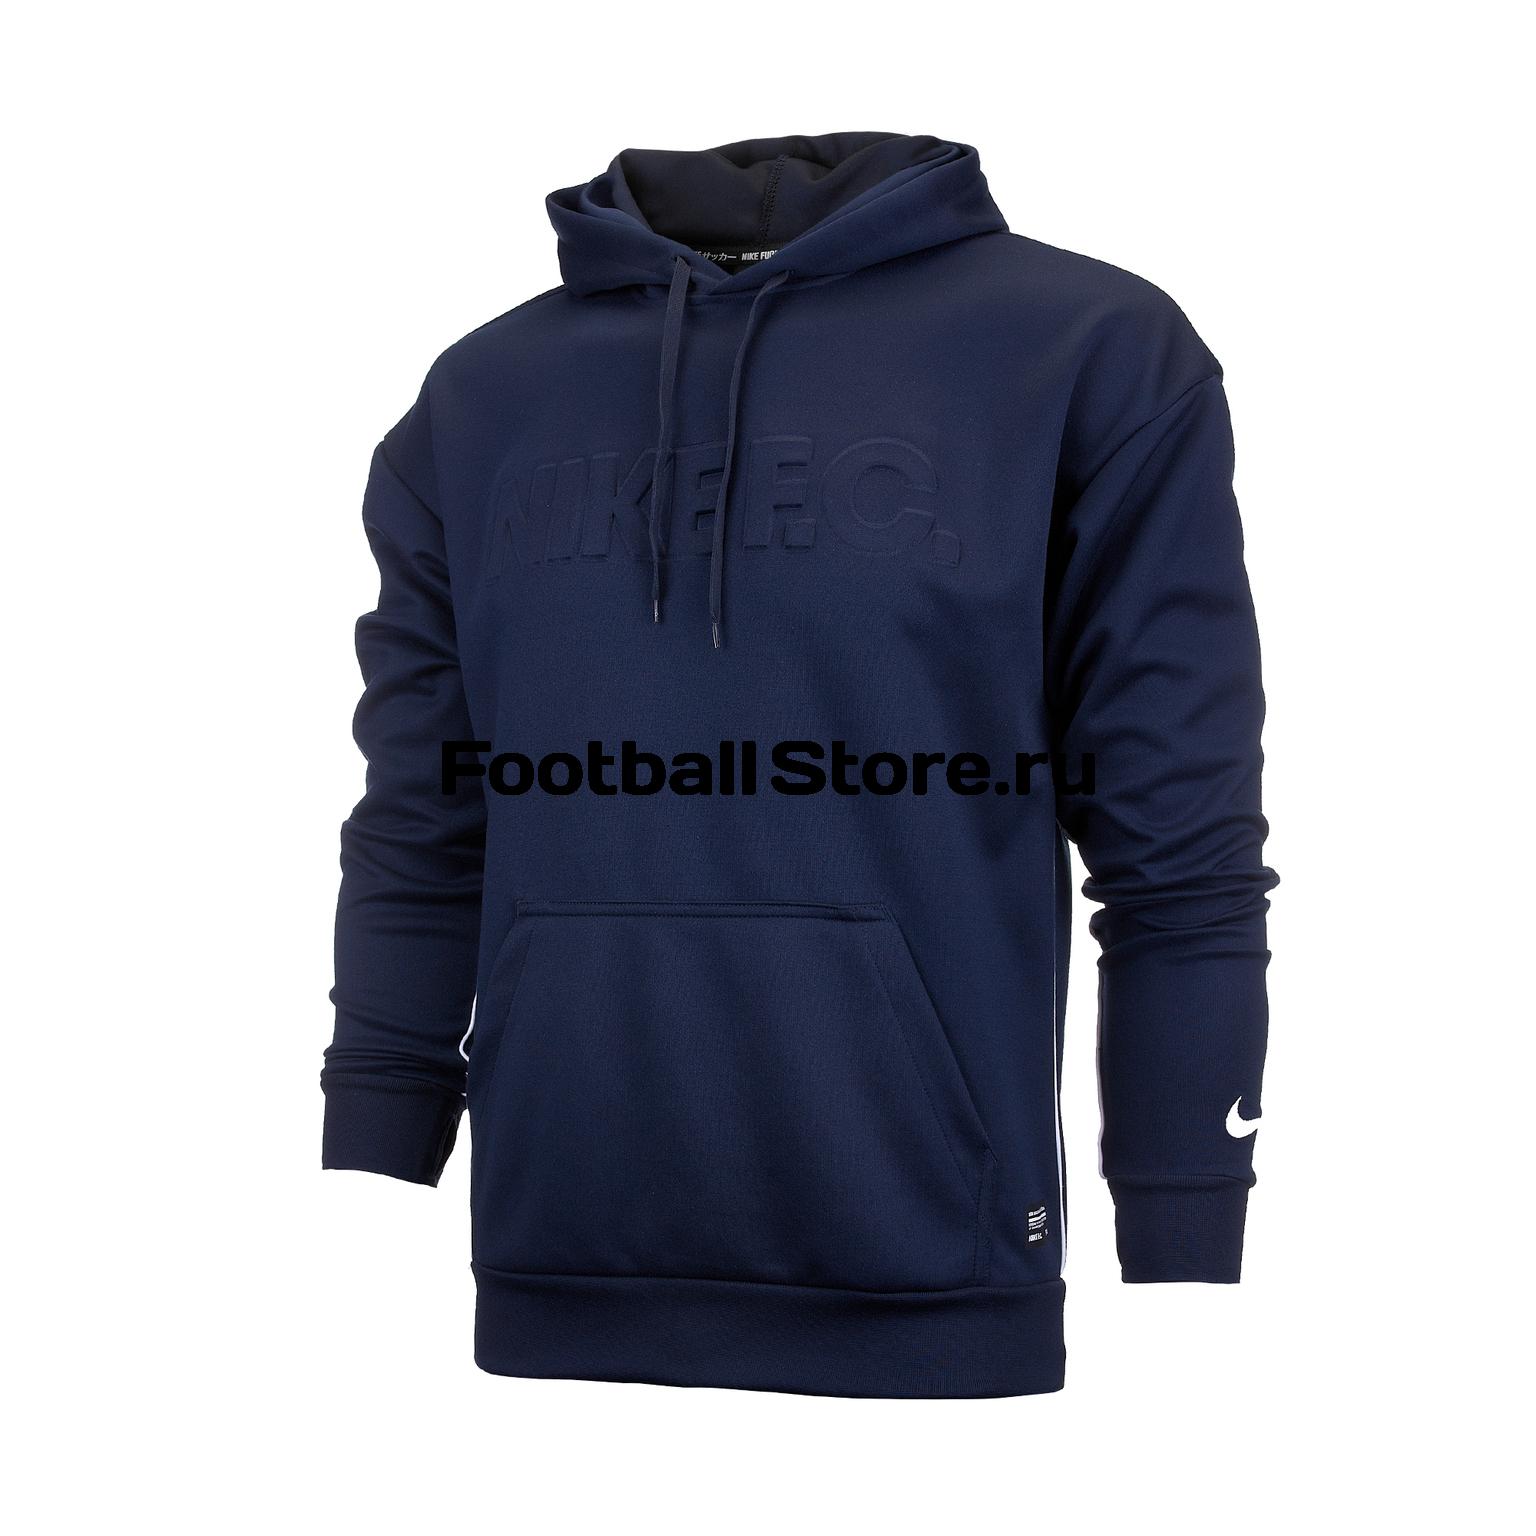 3c325e15 Толстовка Nike F.C. Hoodie AR8002-451 – купить в интернет магазине  footballstore, цена, фото